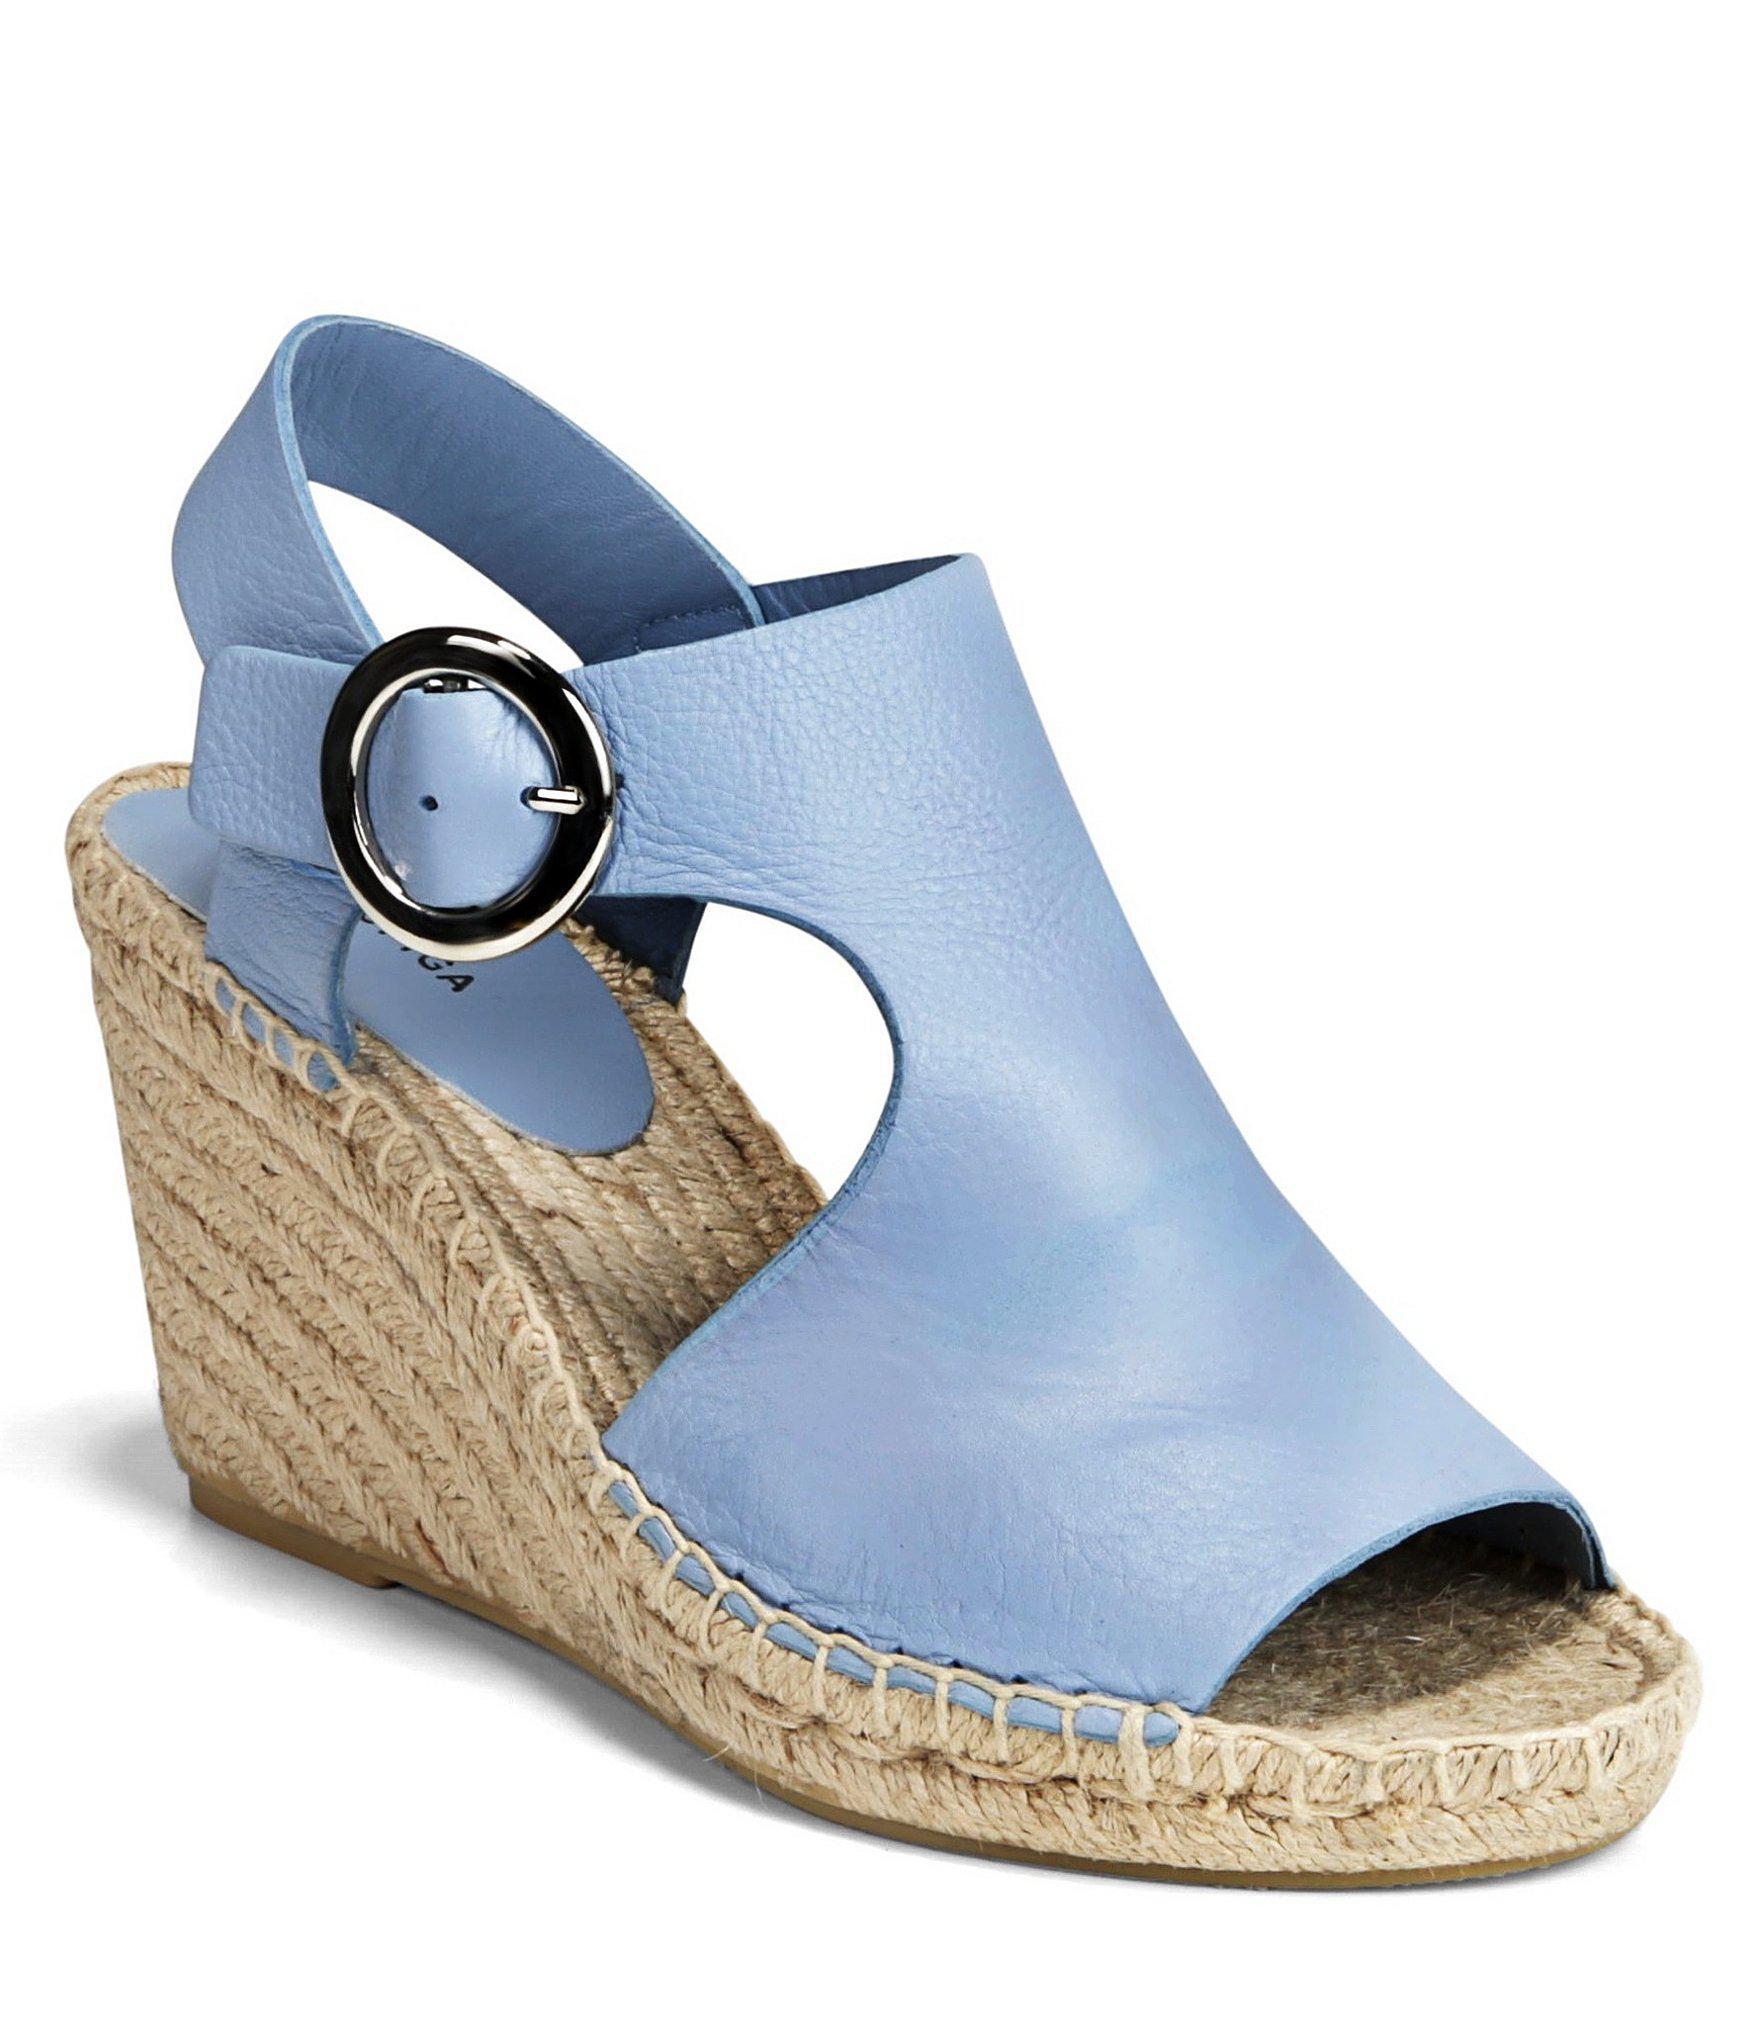 01f993474a63 Lyst - Via Spiga Nolan Espadrille Wedge Sandal in Blue